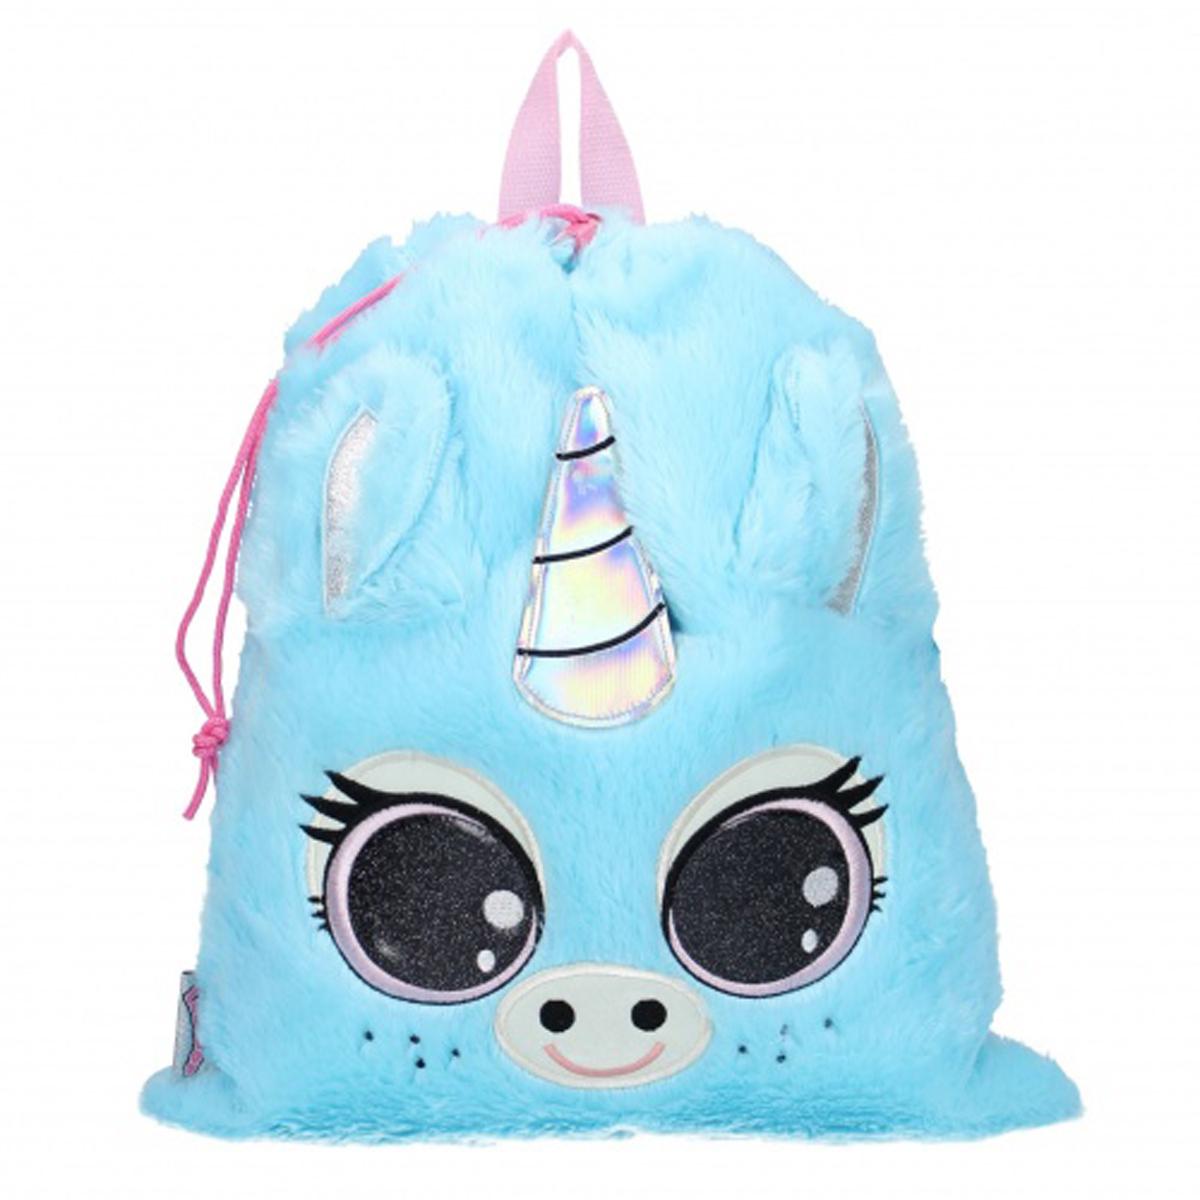 Sac de gym \'Licorne My Unicorn\' bleu (Lulupop & the Cutiepies) - 44x37 cm - [Q9752]